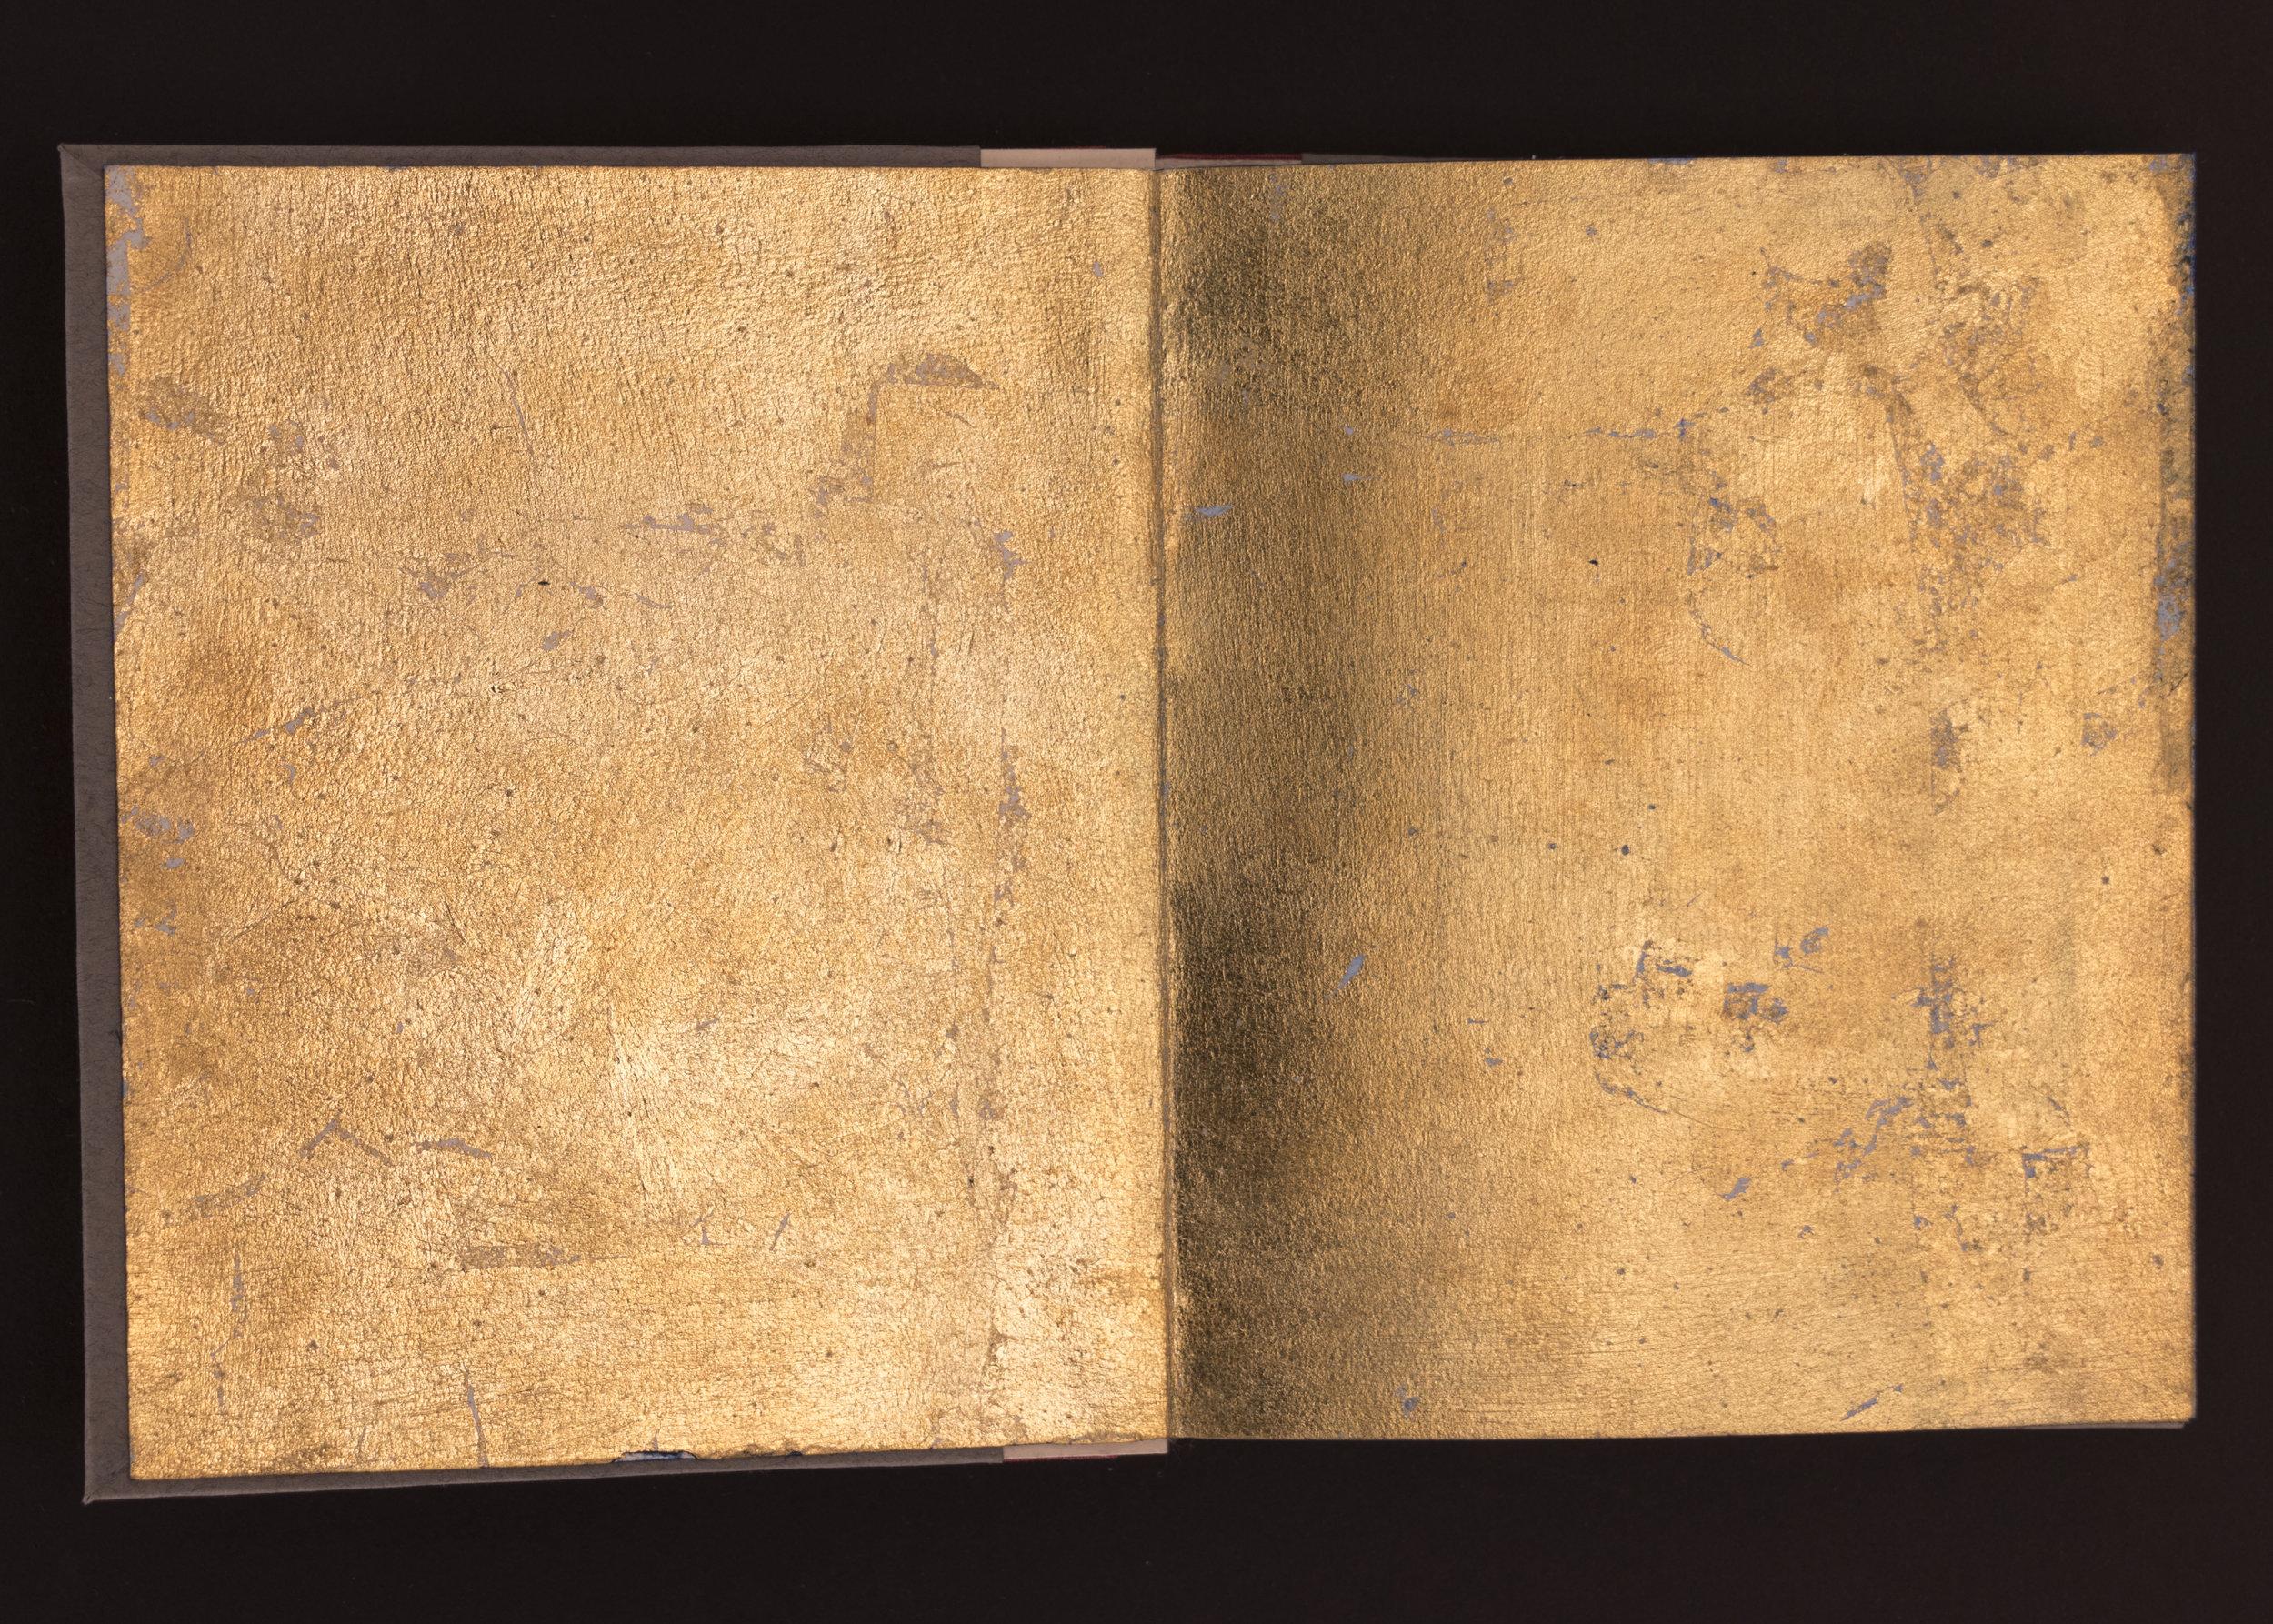 Book_IV1.JPG